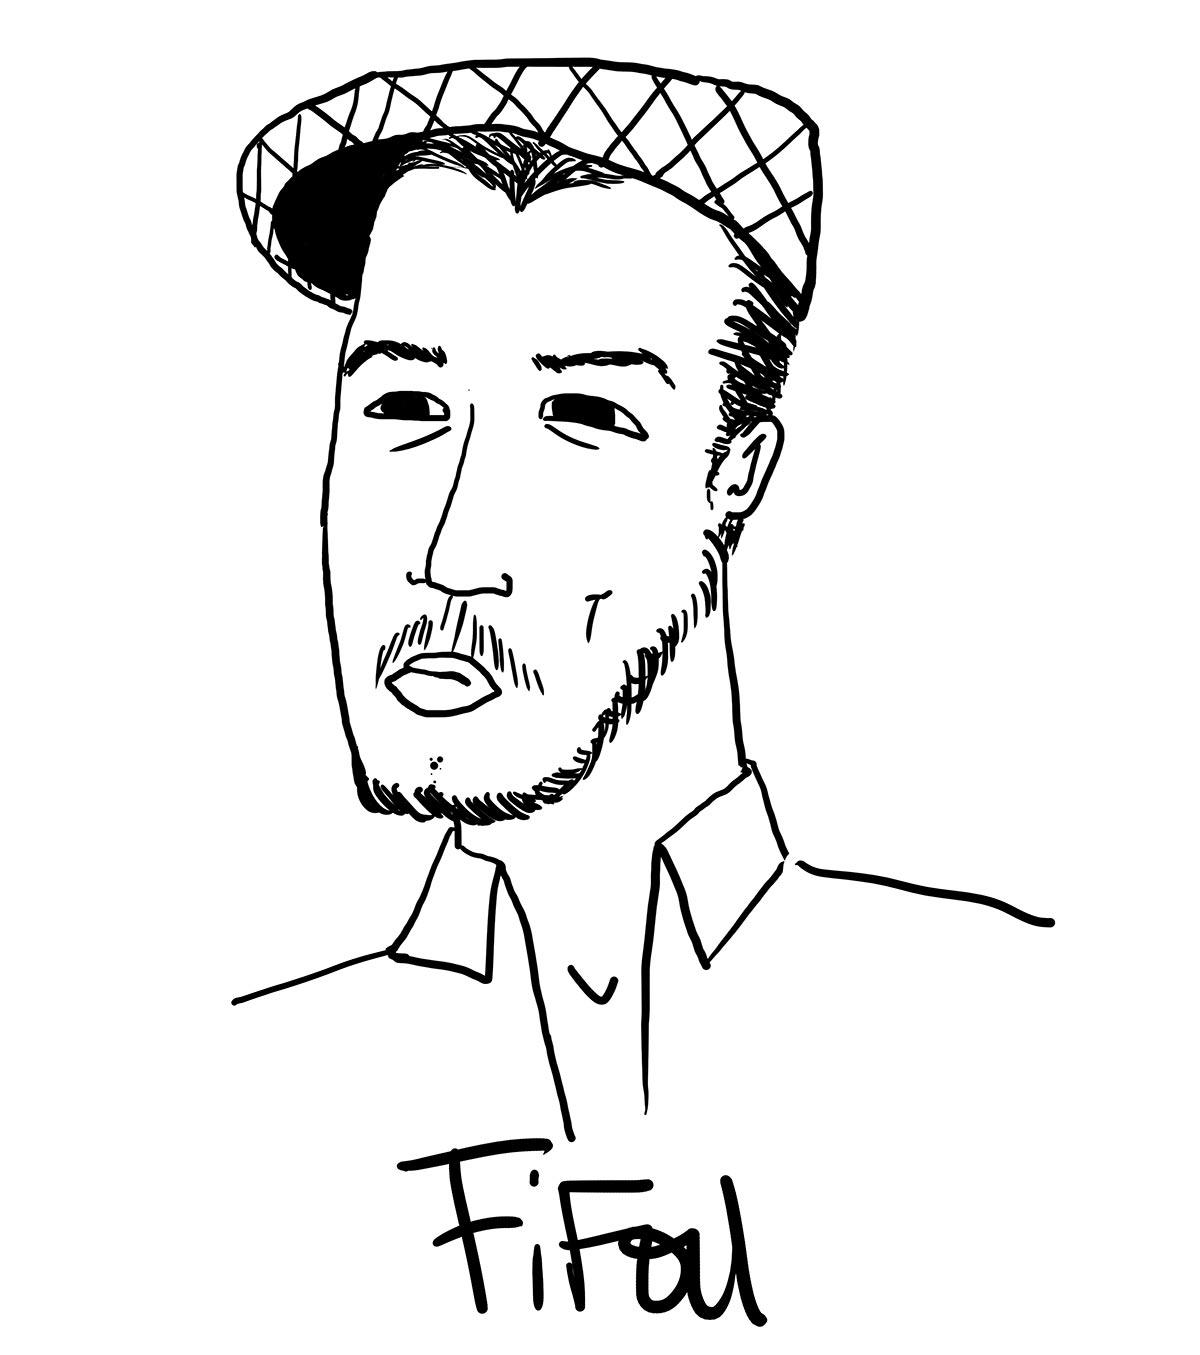 Fifou